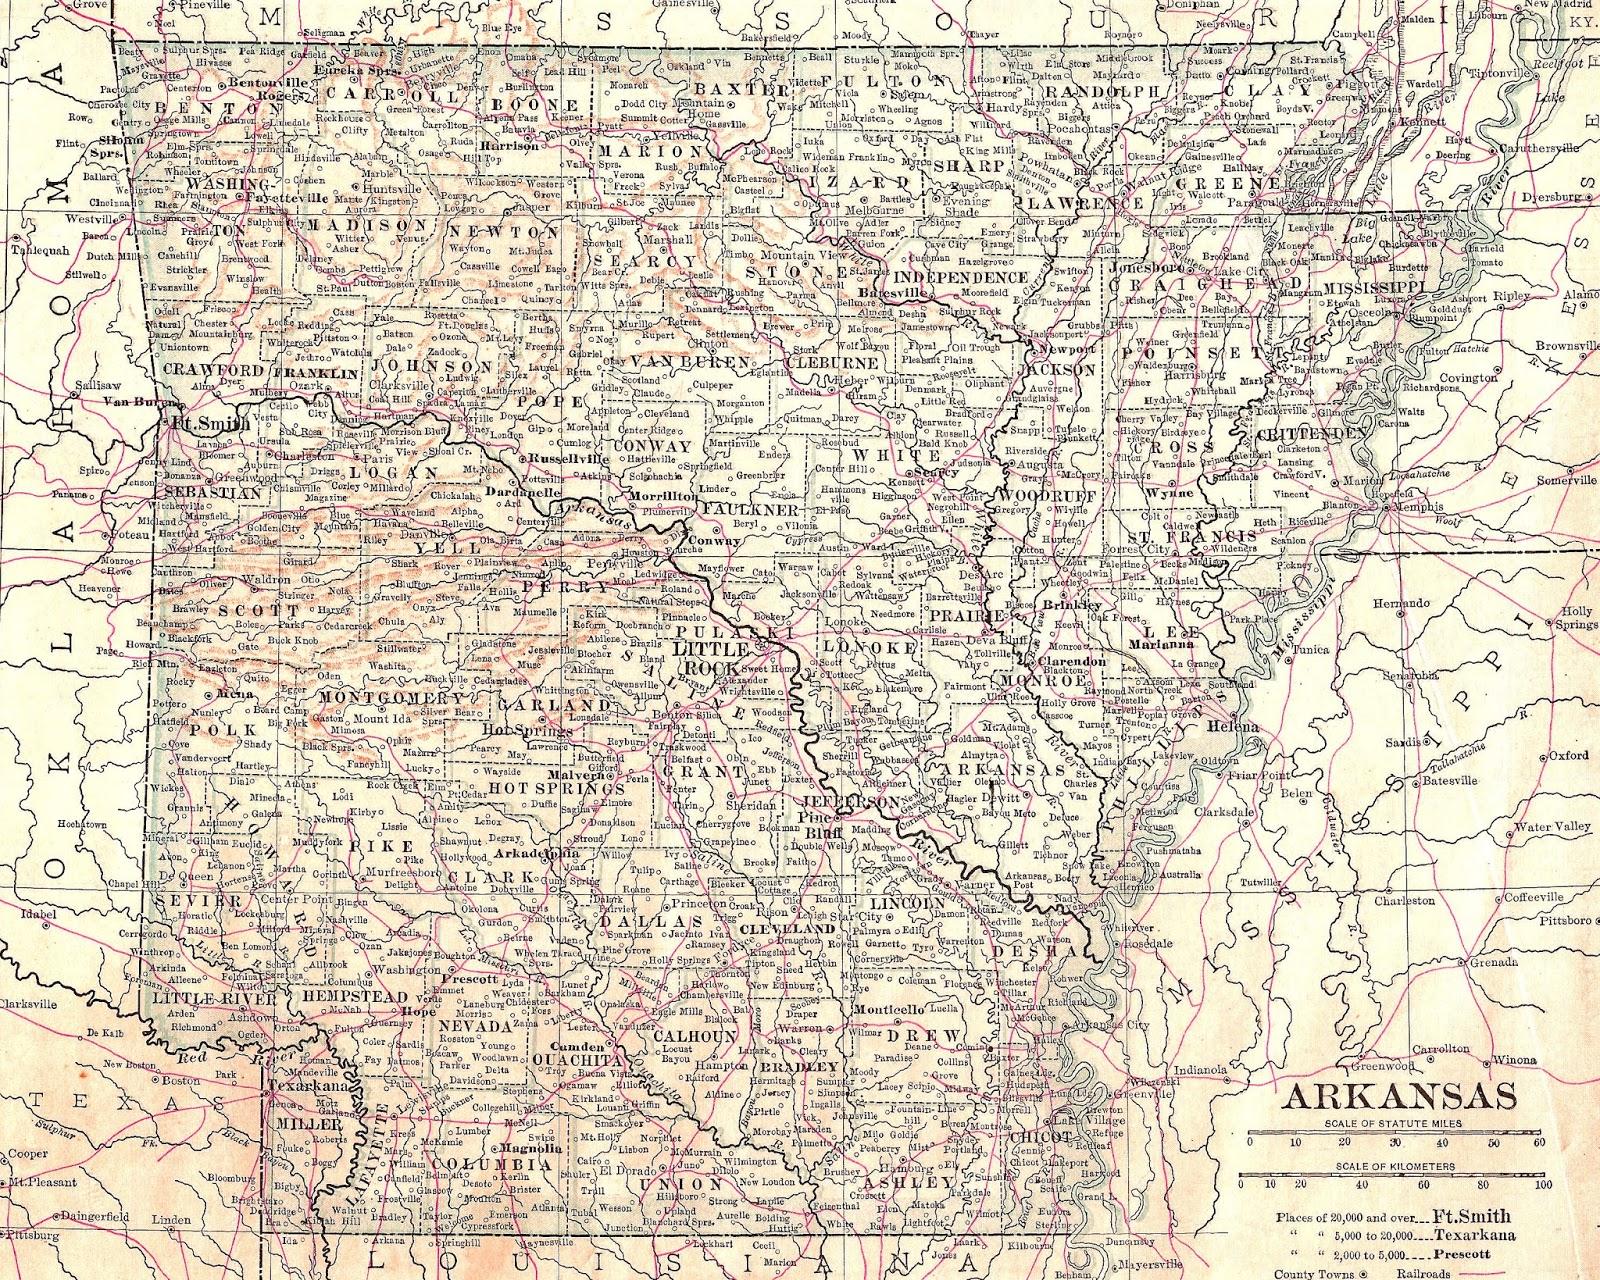 Antique Images Printable Antique Map Free Image United States - Map of united states free printable